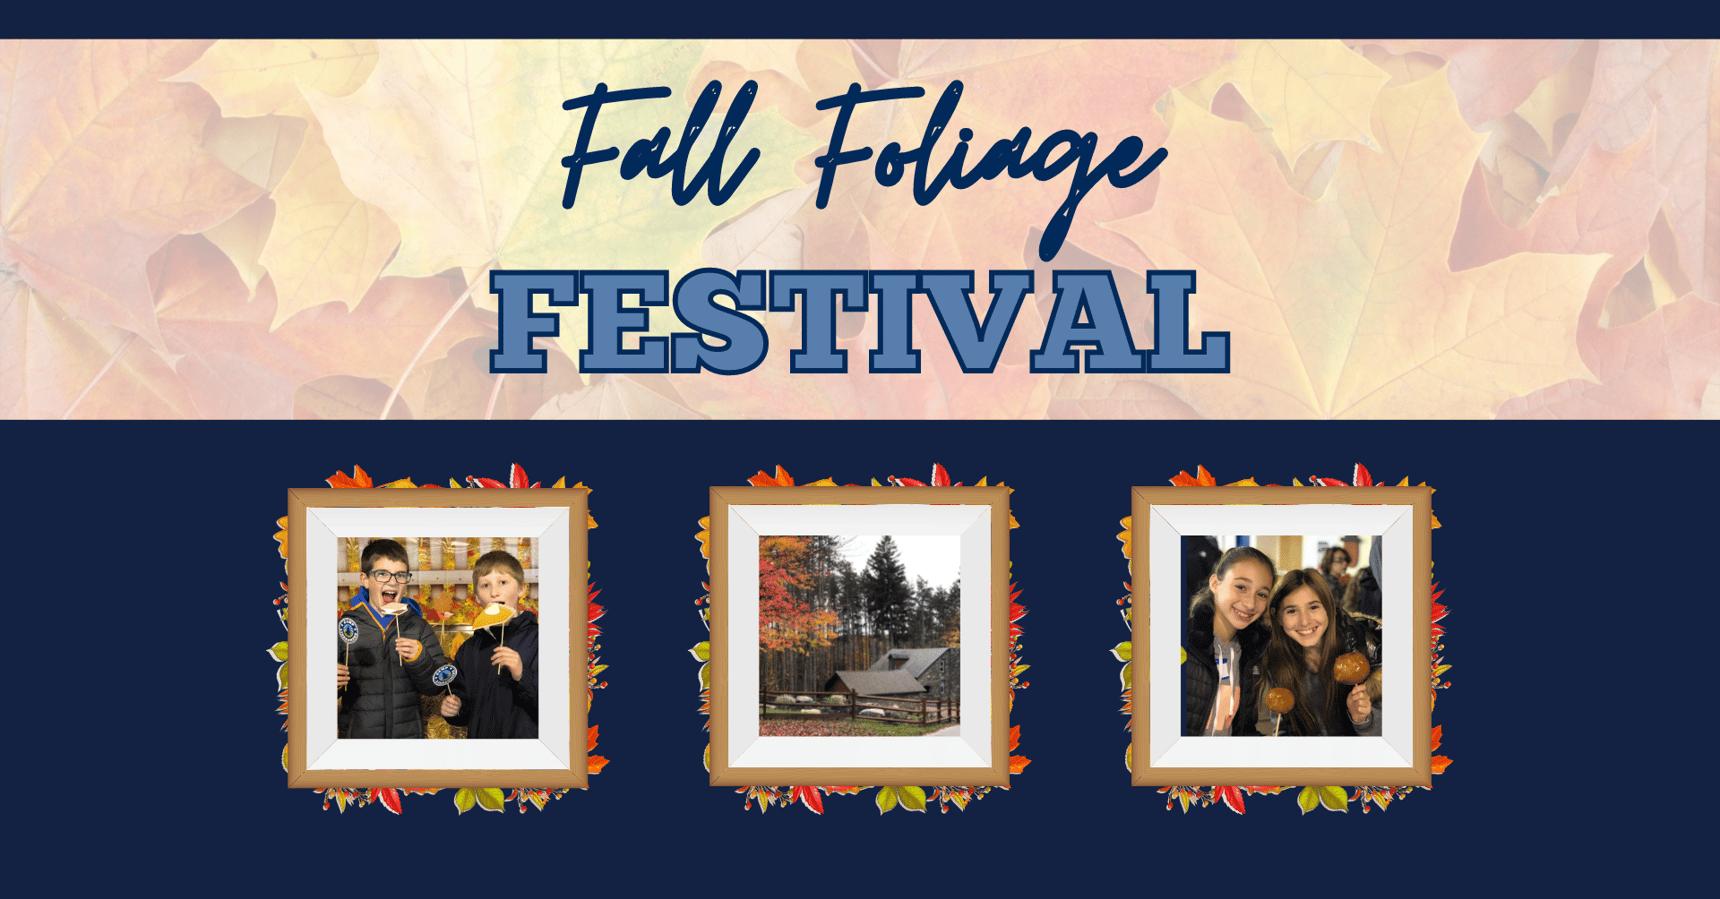 fall foliage v2-3